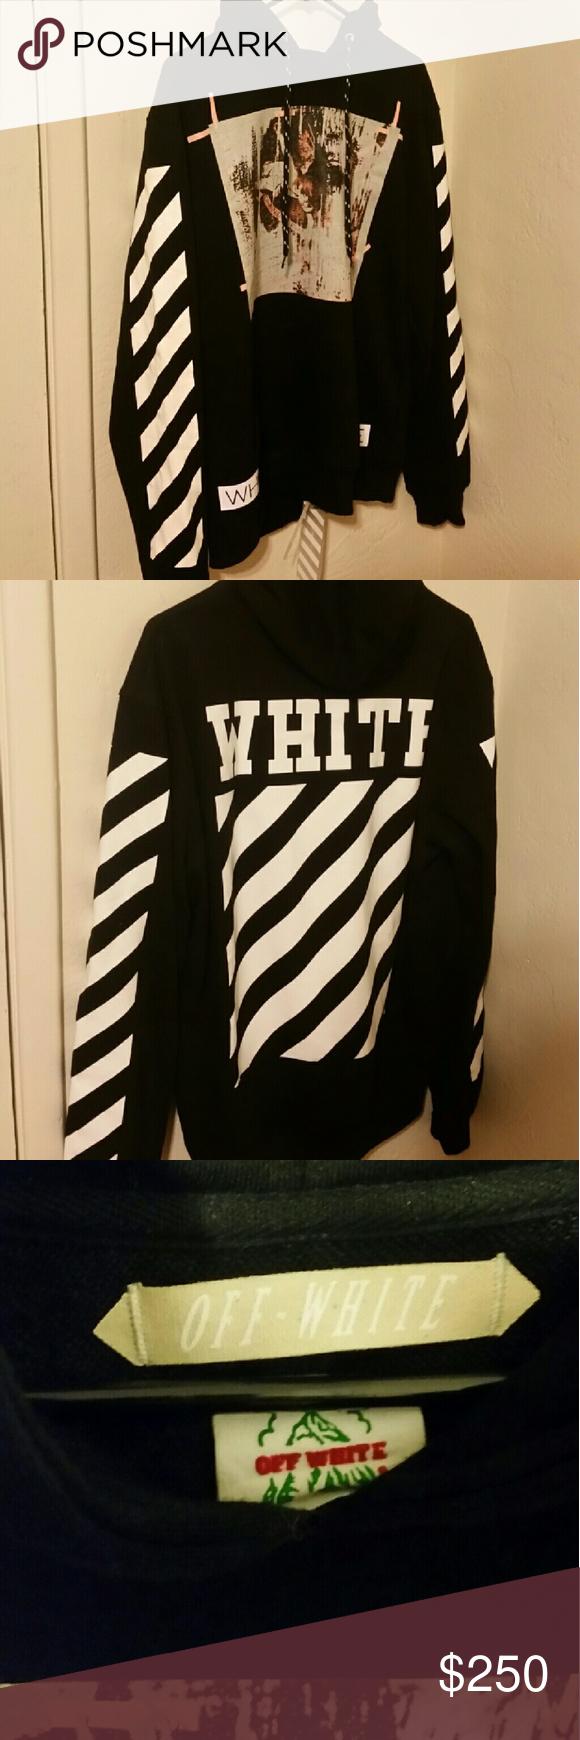 Off White C O Black Caravaggio Hoodie W Receipt Worn Once For Less Than An Hour Still Has Tags Receipt Shown Upon Requ Clothes Design Fashion Design Fashion